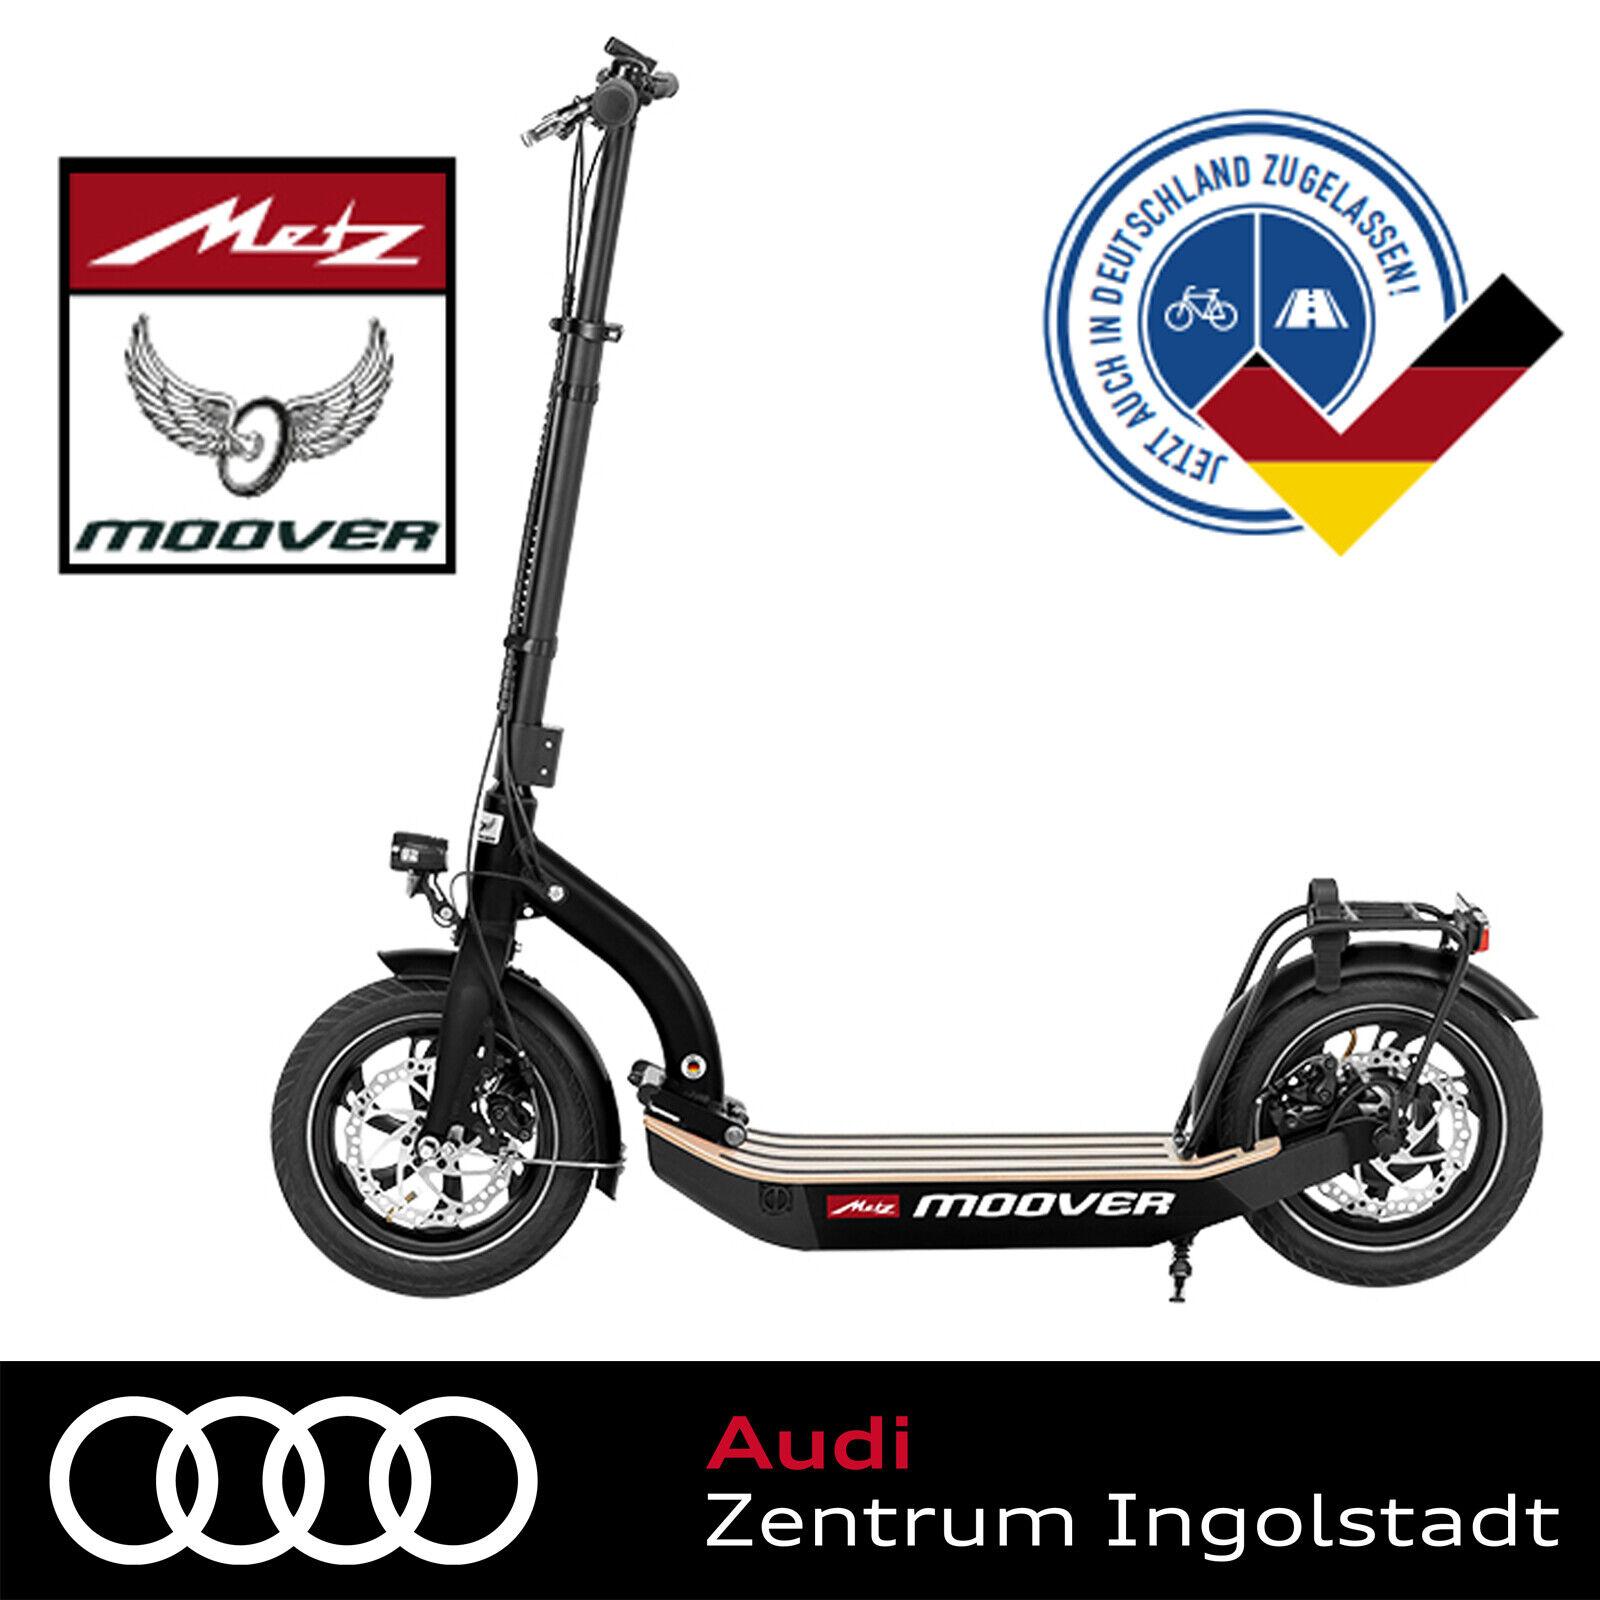 Metz moover E-Scooter Schwarz bis 20 km/h 090170044, eScooter, E Roller, Elektro